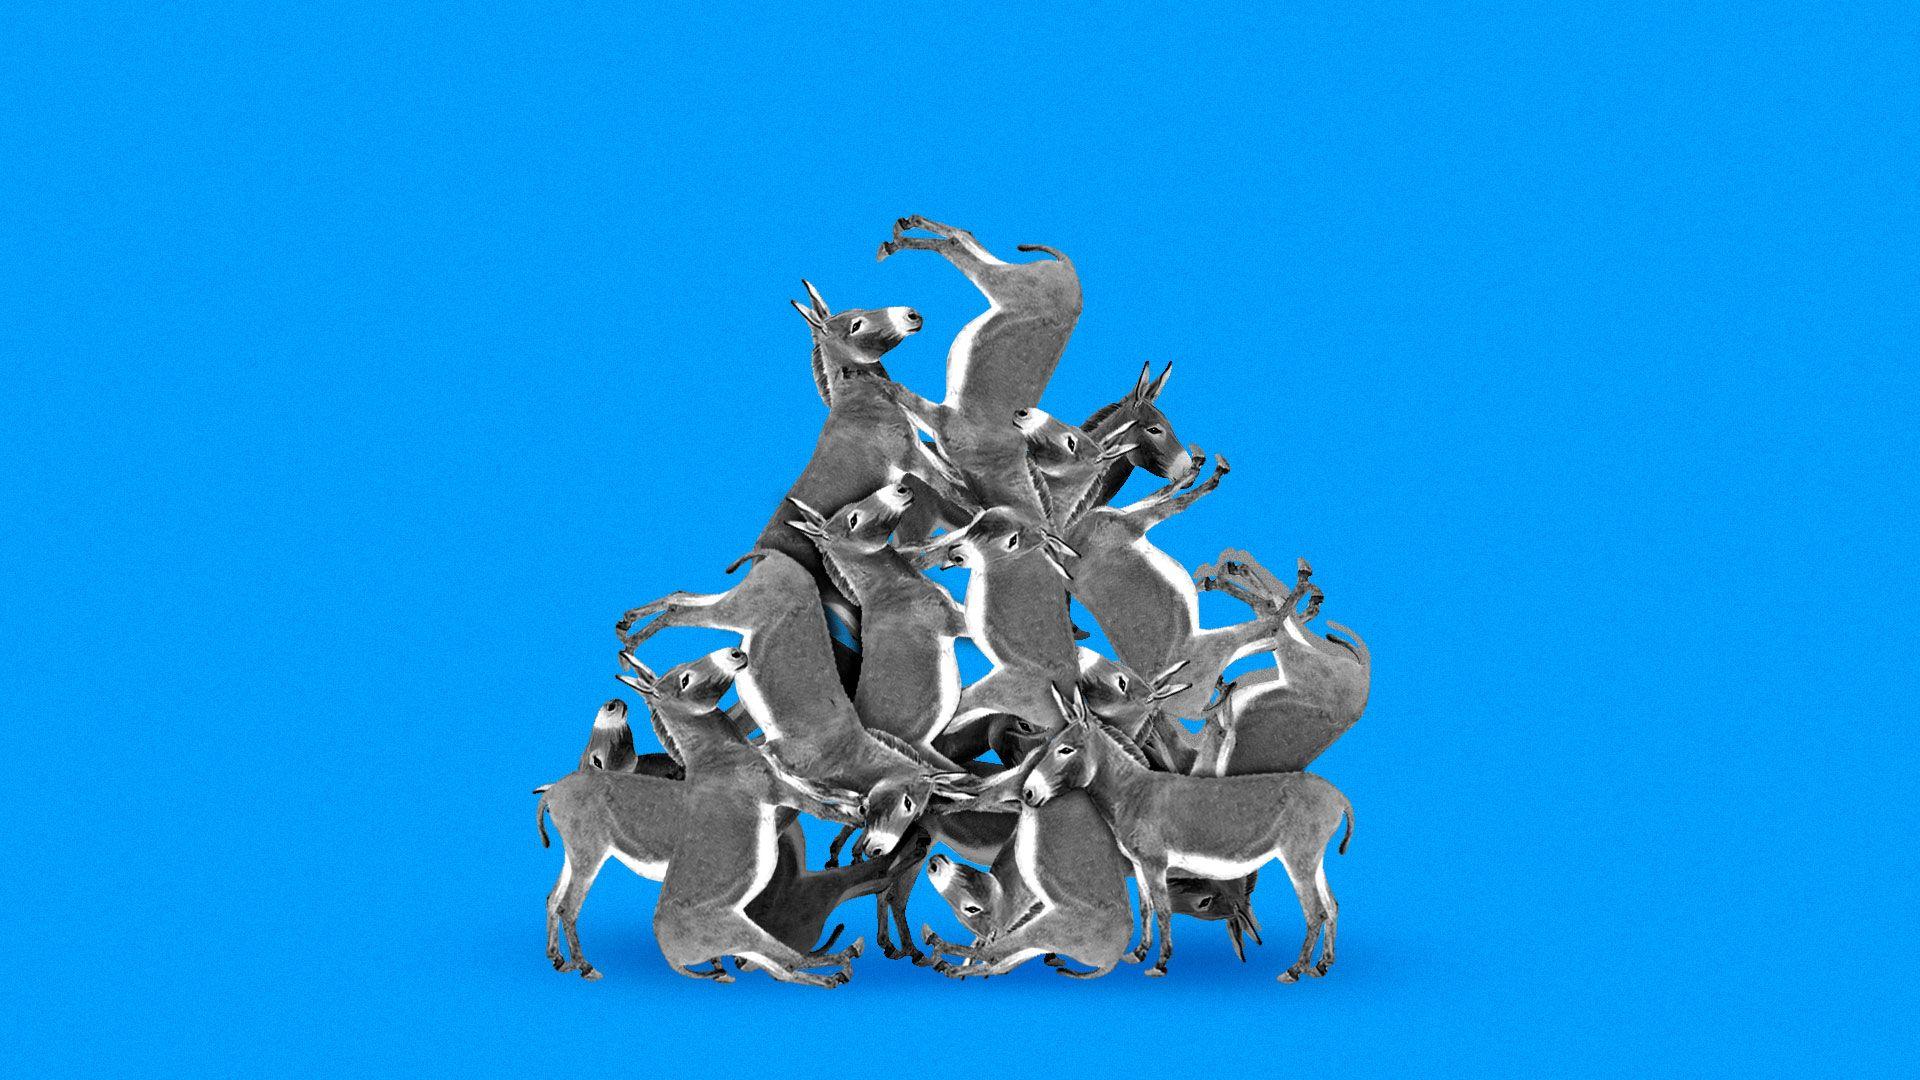 Illustration of a pile of donkeys